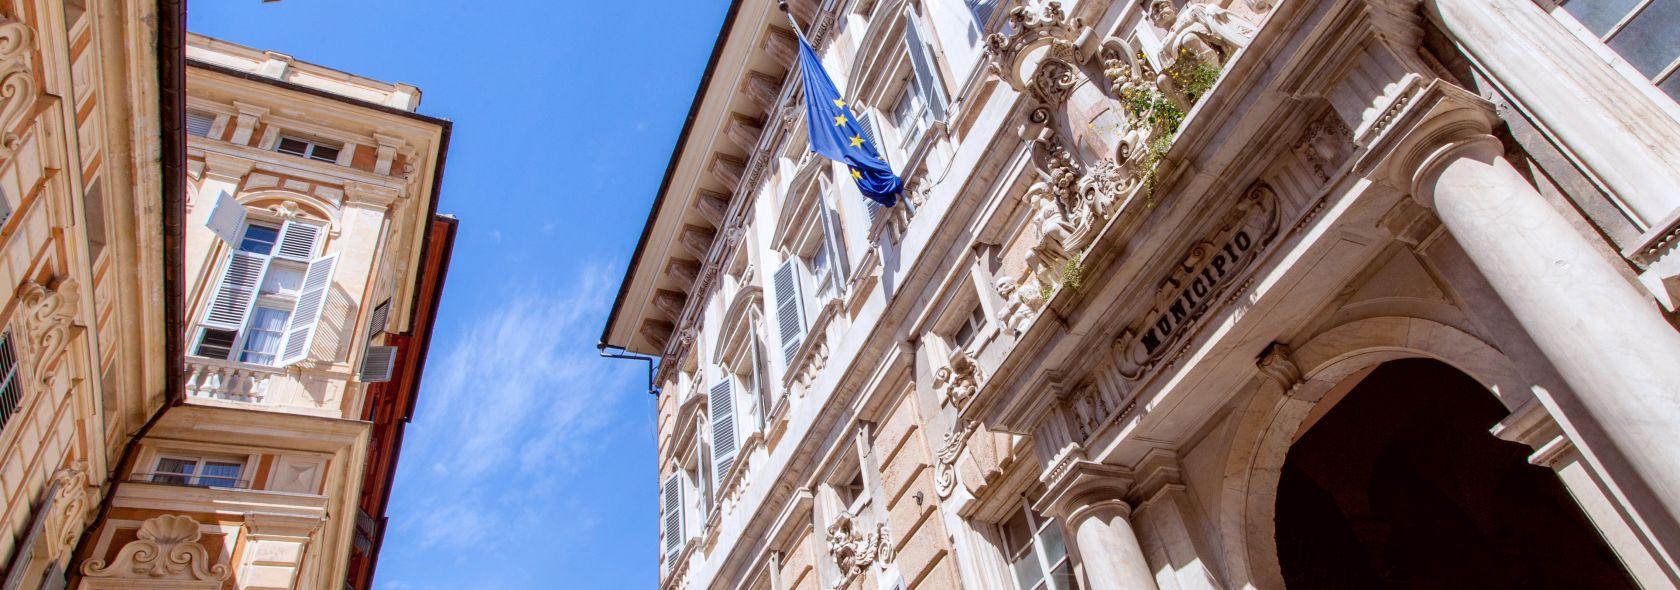 Palazzo Tursi - © Foto Xedum